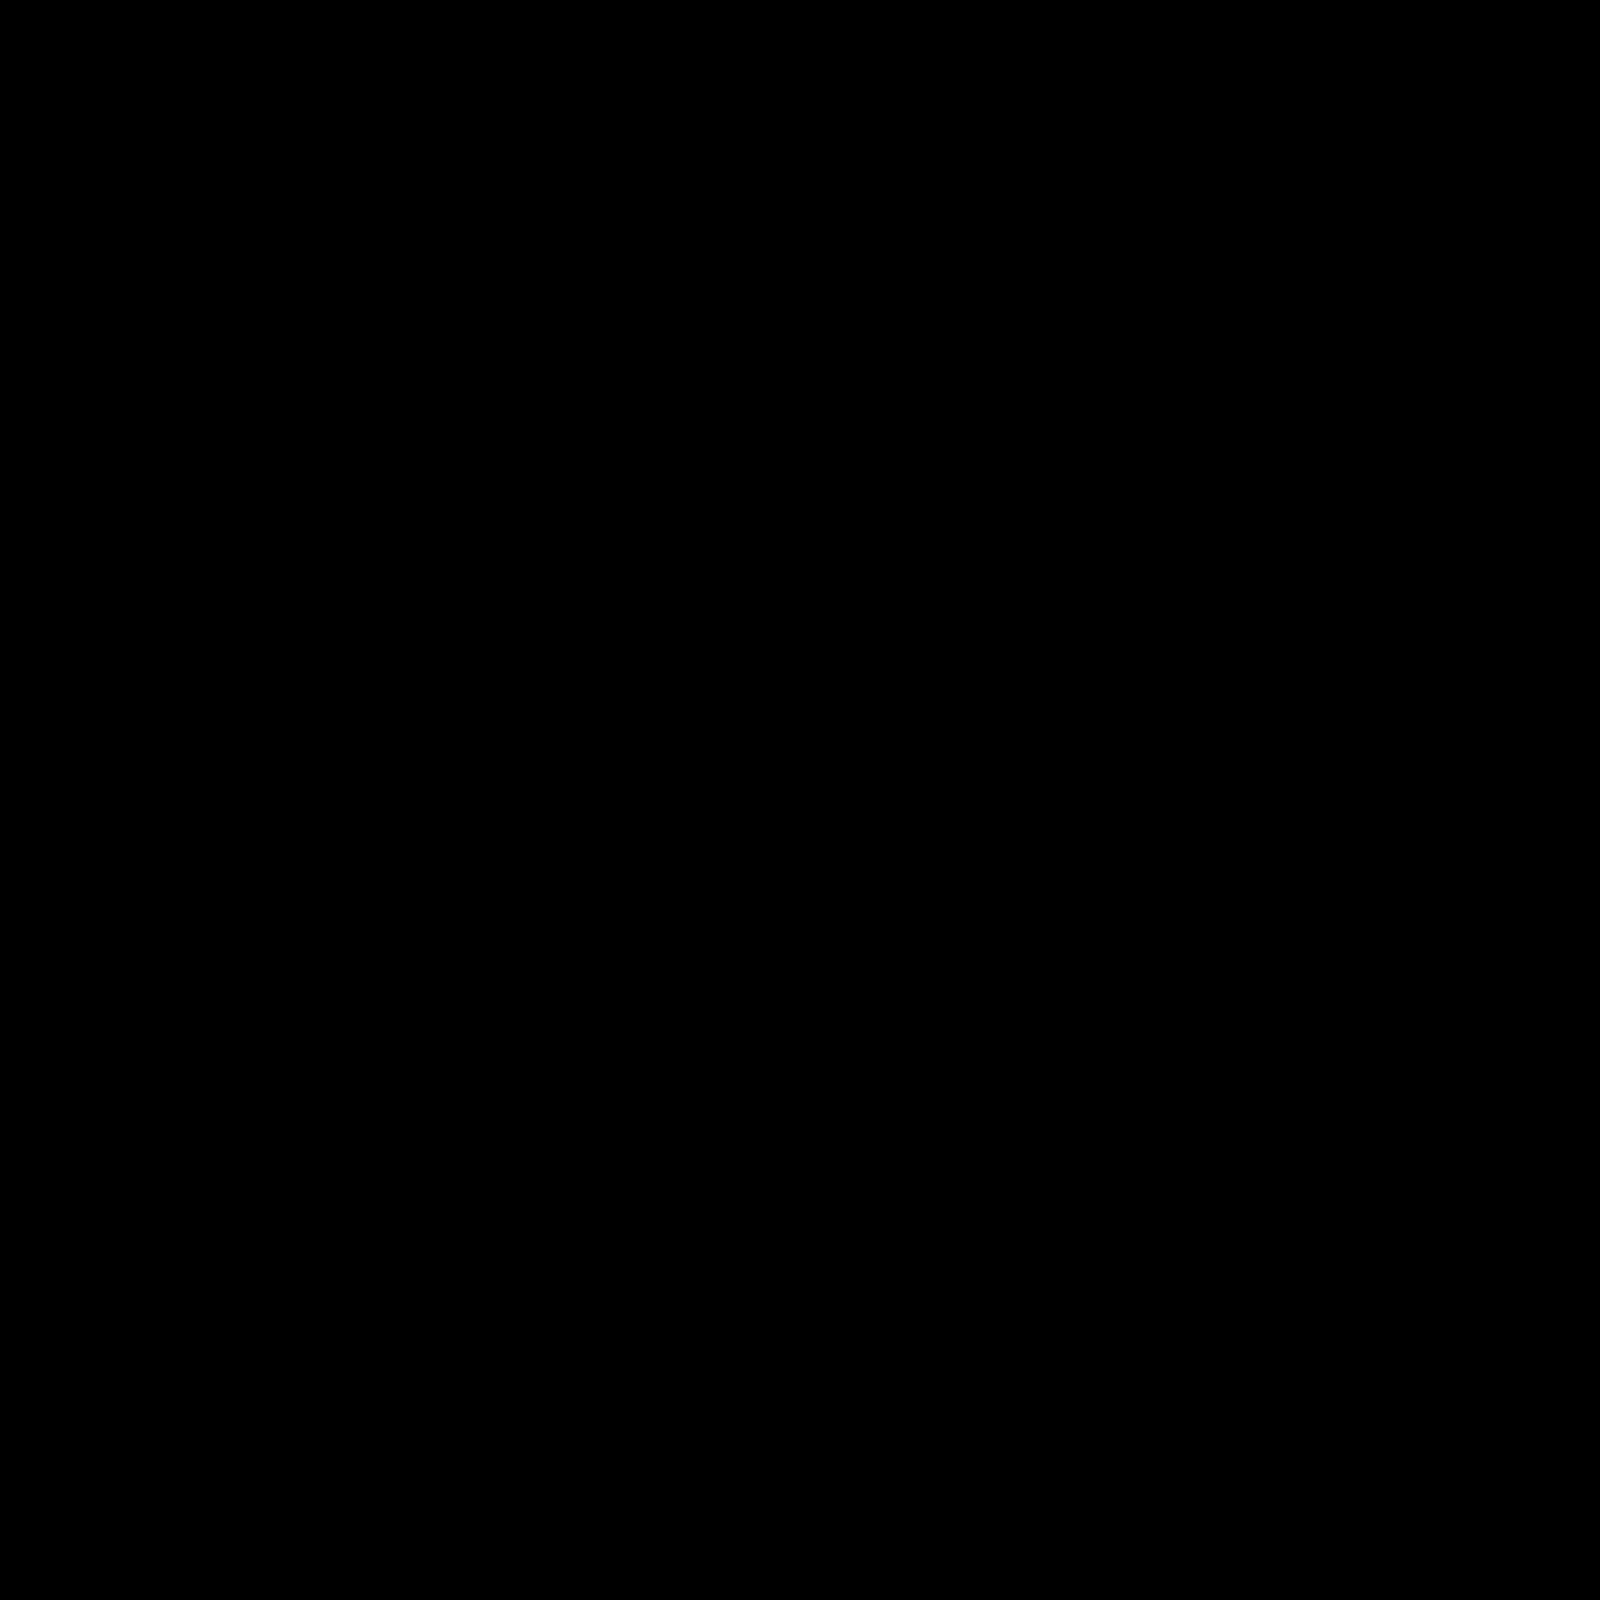 Планшет на андроиде icon. It's an icon of a smartphone laying horizontally. The Android alien logo is on the screen.